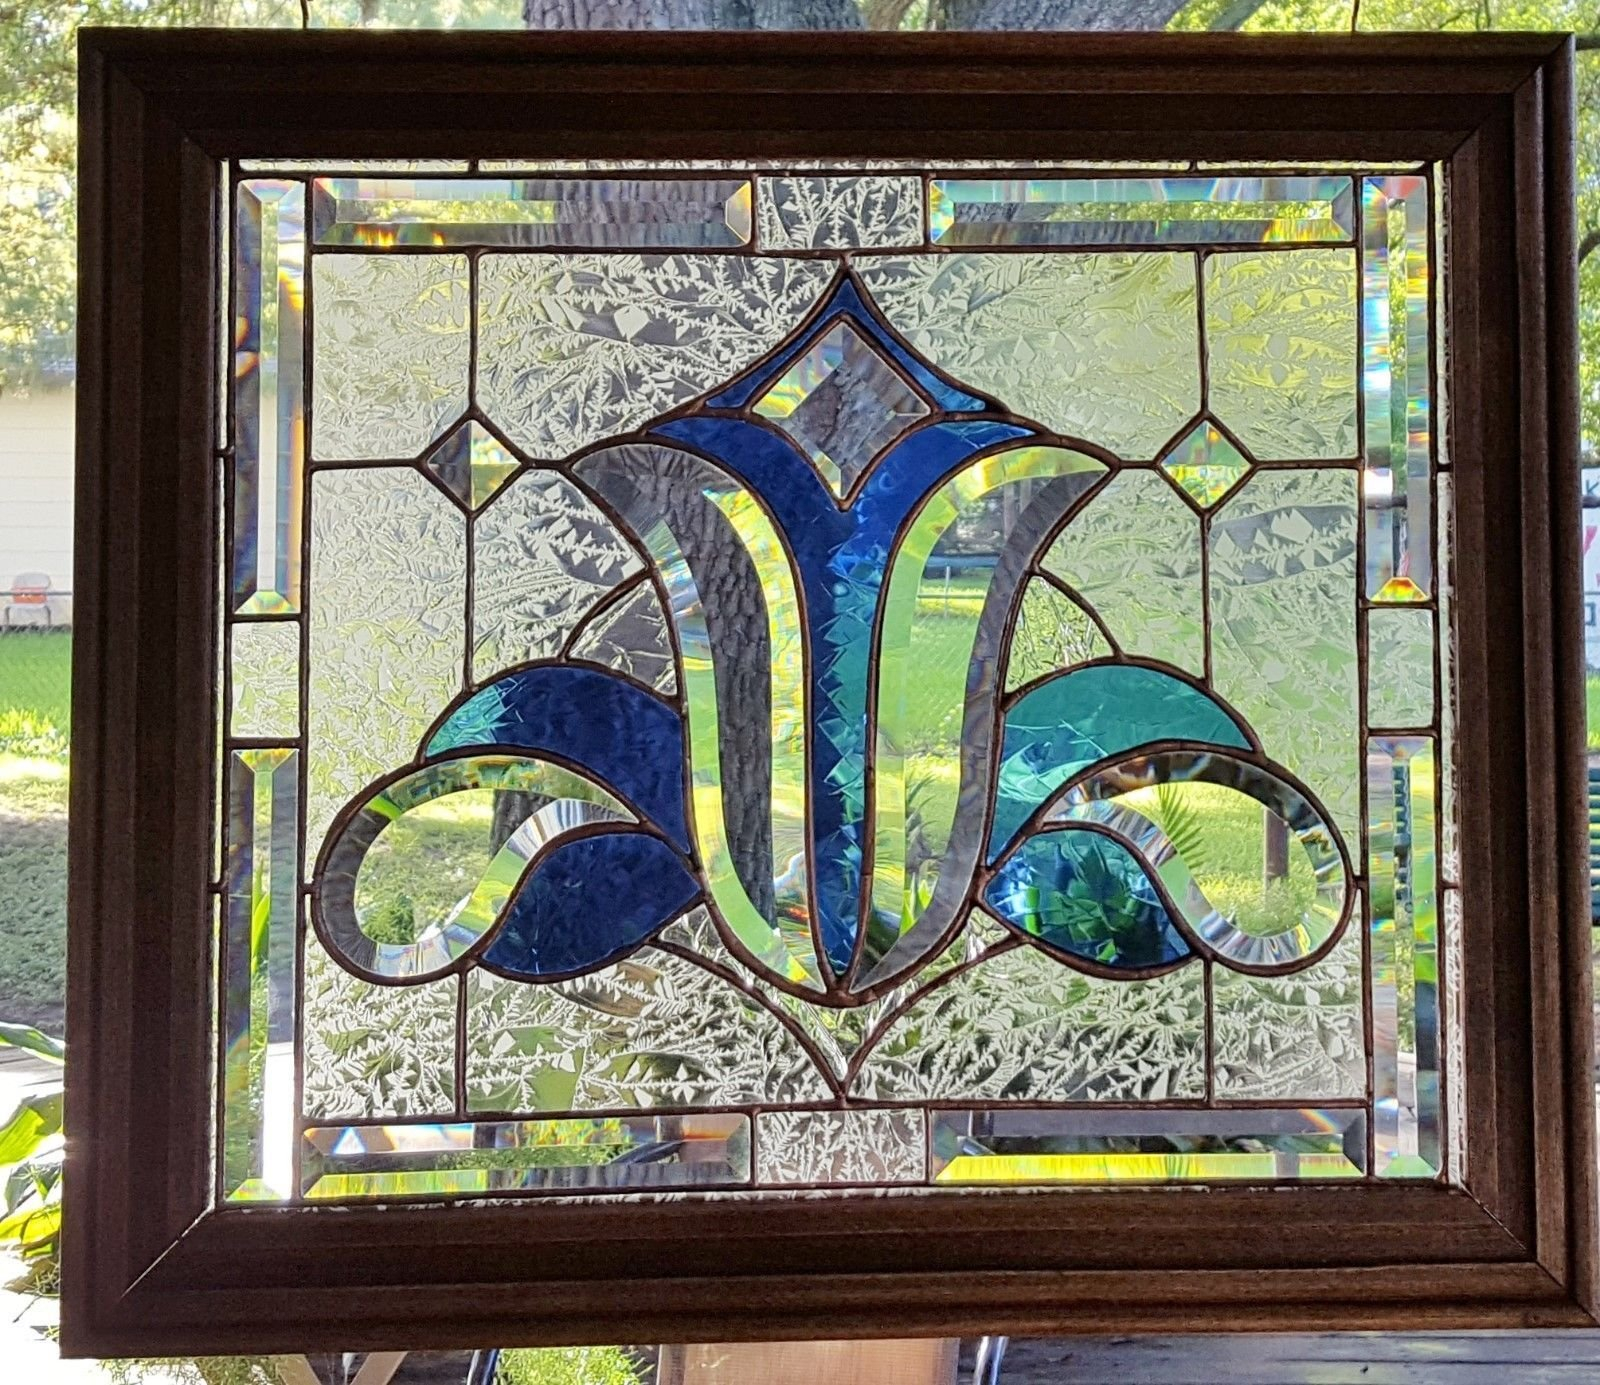 Stained Glass Blueprints Worksheet Answer Key  Briefencounters For Stained Glass Blueprints Worksheet Answer Key